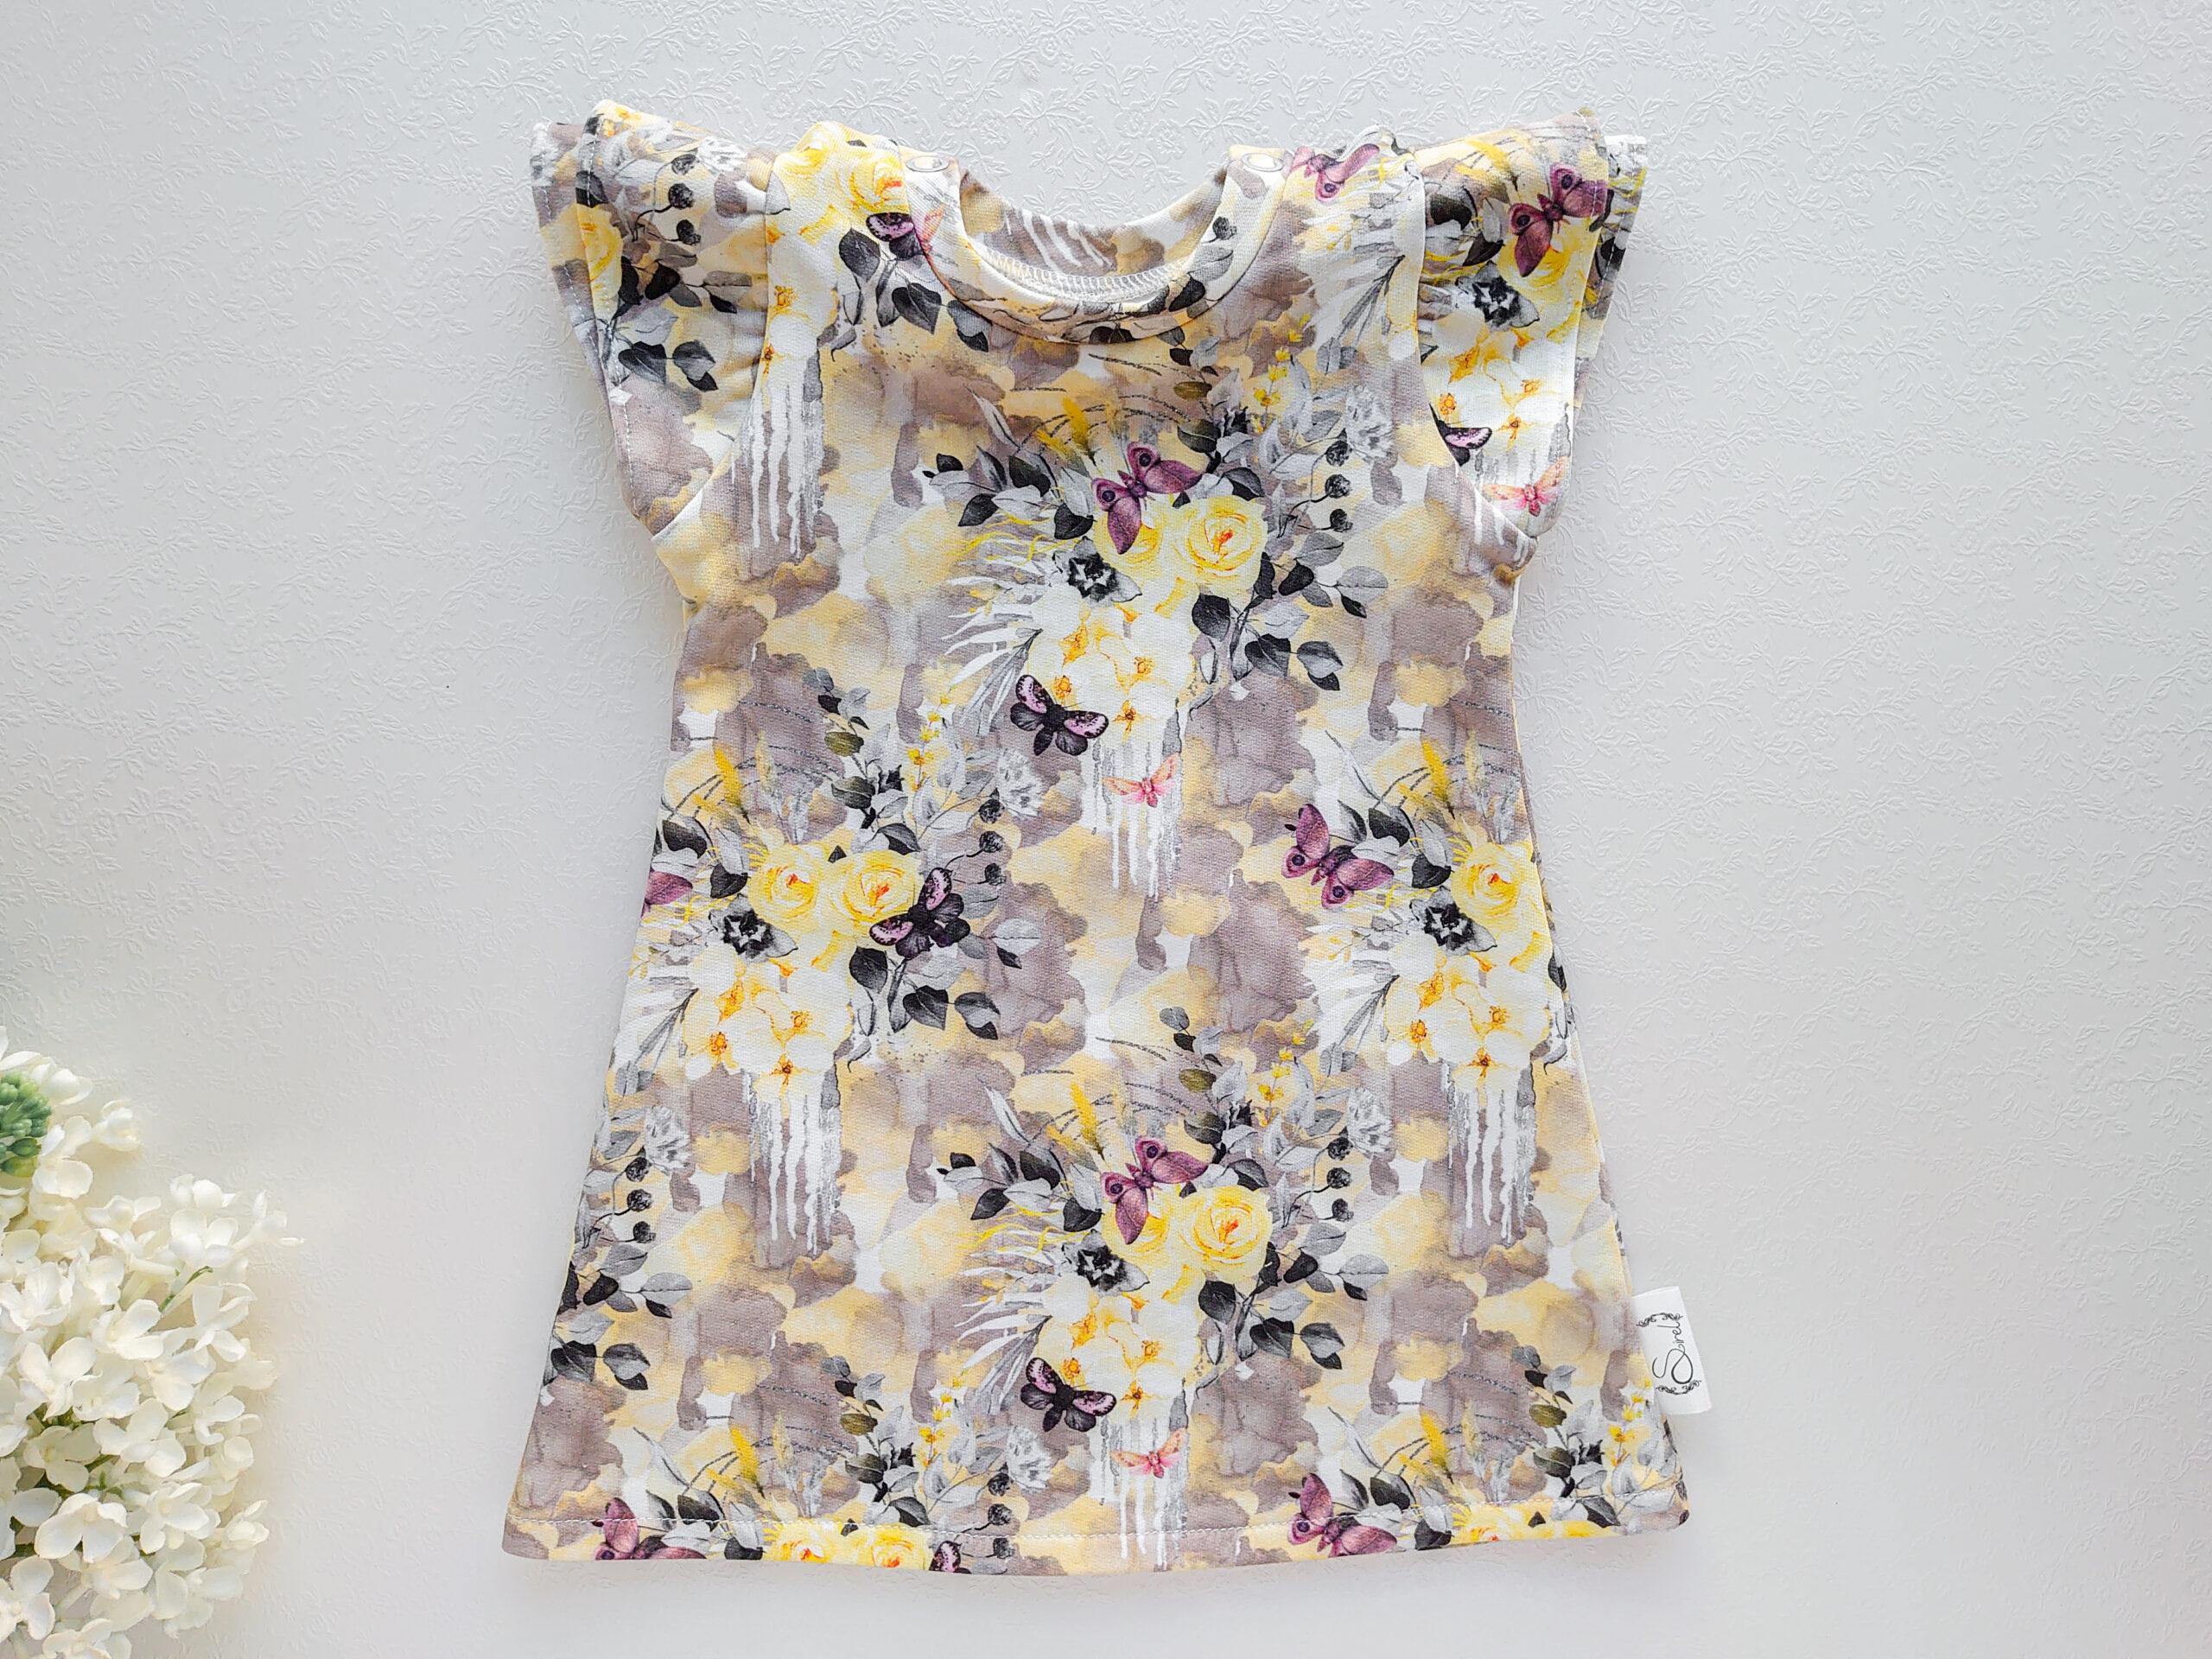 Tüdrukute kollane lilledega lilleline kleit